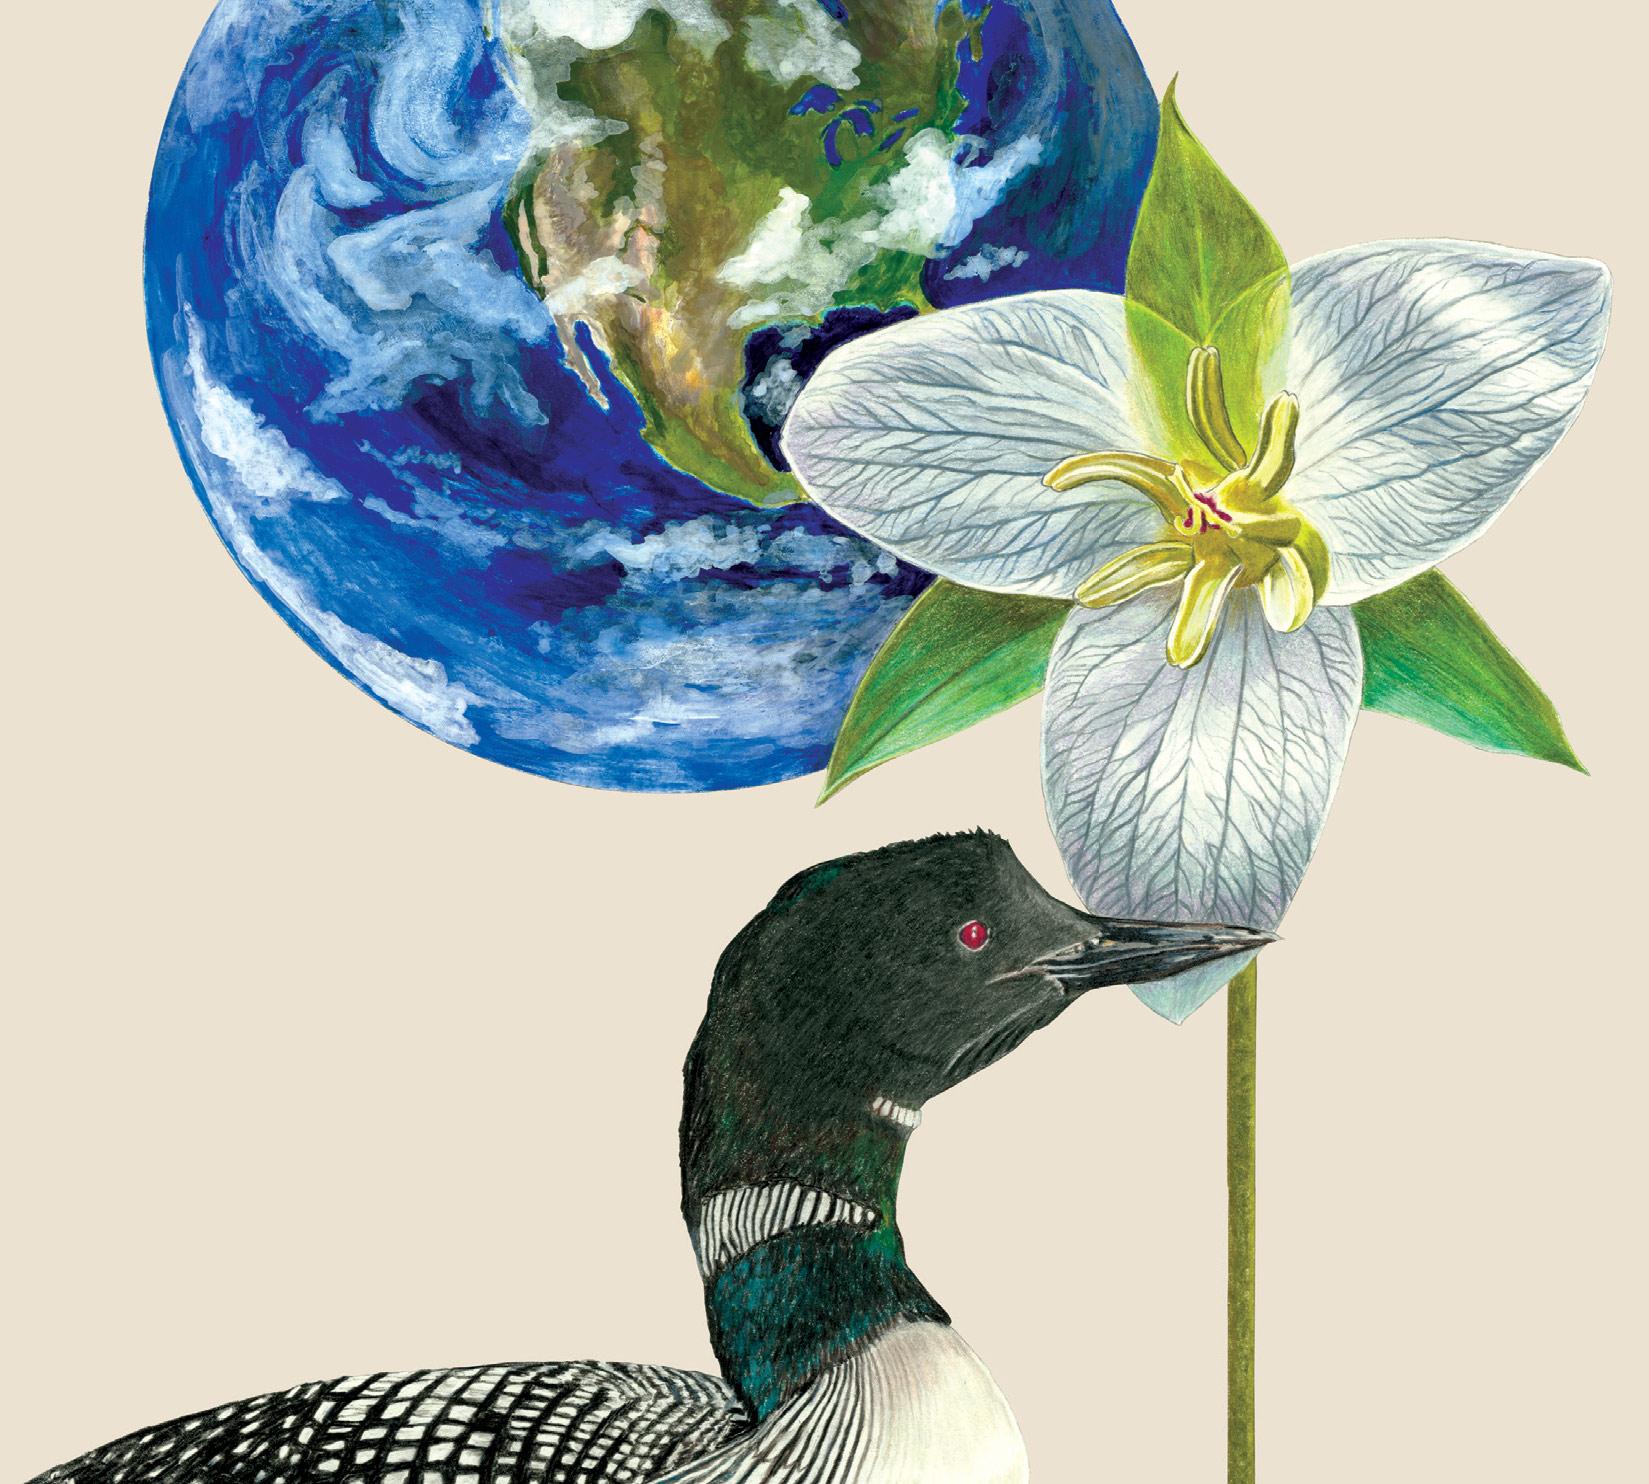 Grateful Dead Spring 1990 The Other One Hamilton 3/21/90 album cover artwork